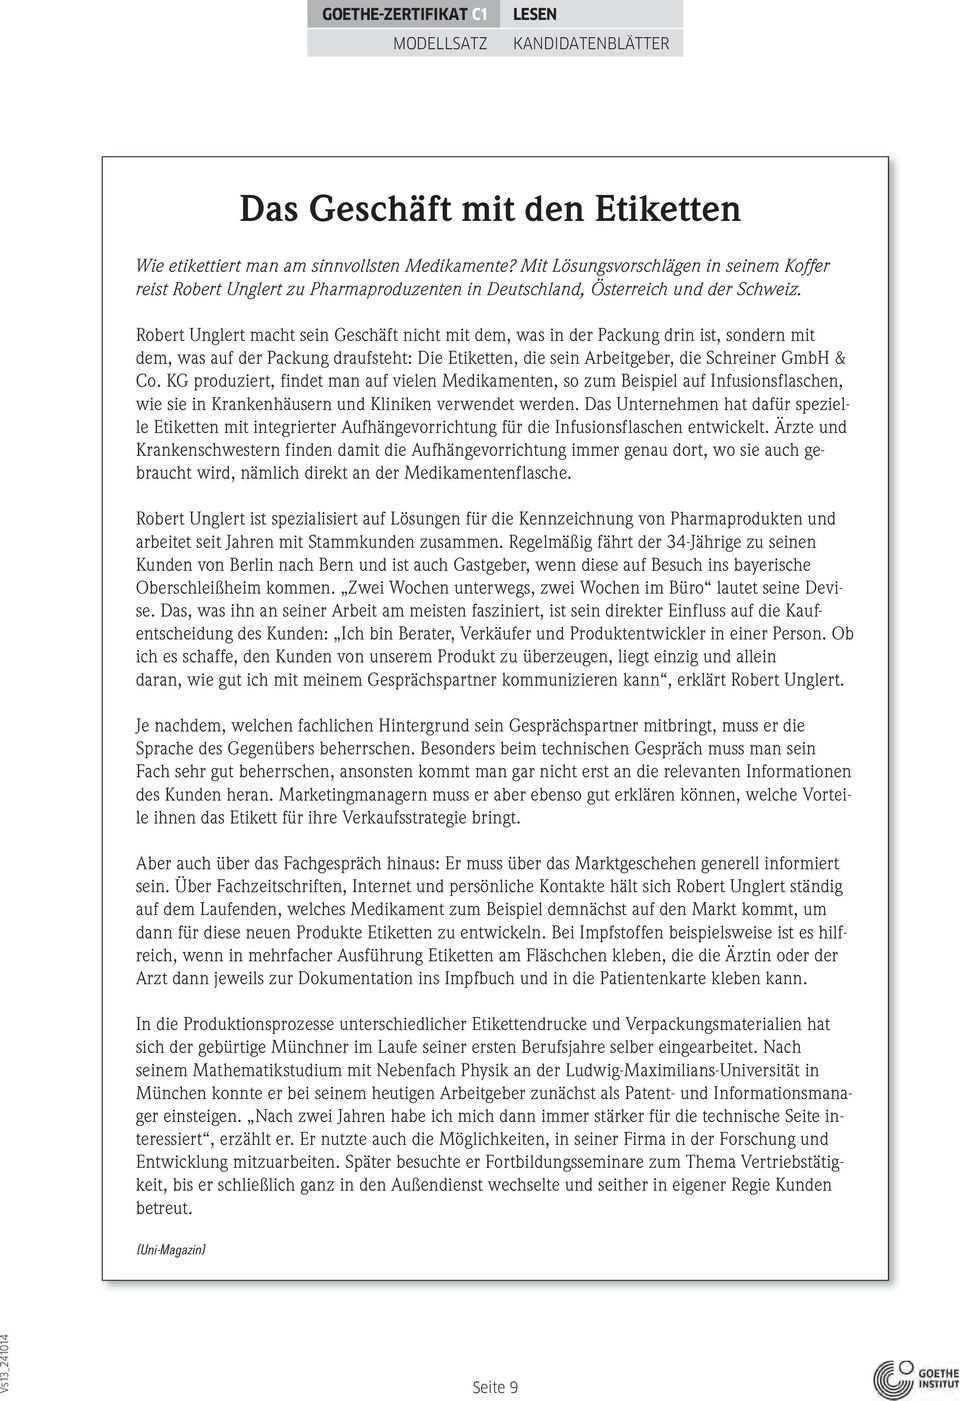 Goethe Zertifikat C1 Modellsatz Pdf Kostenfreier Download